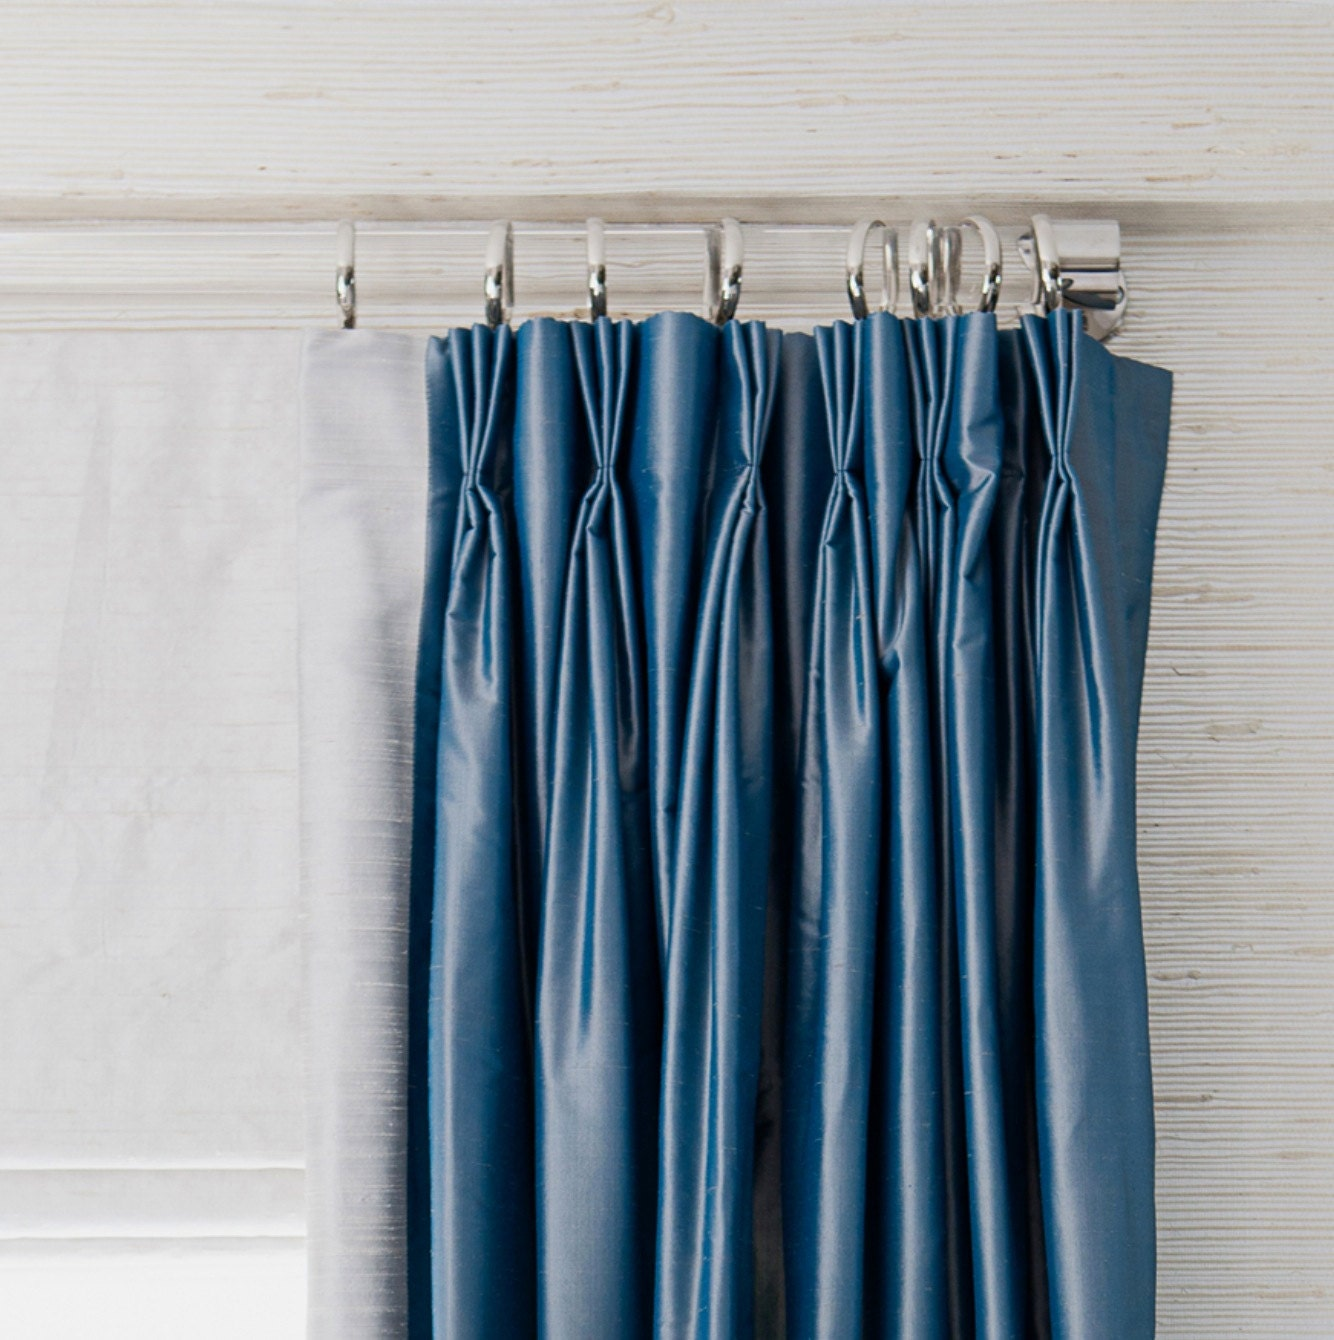 Custom Lucite Curtain Rod Brass Or Nickel 1 37 Dia Lucite Curtain Rod Lucite Drapery Rod Drapery Rod 97 160 Luxholdups